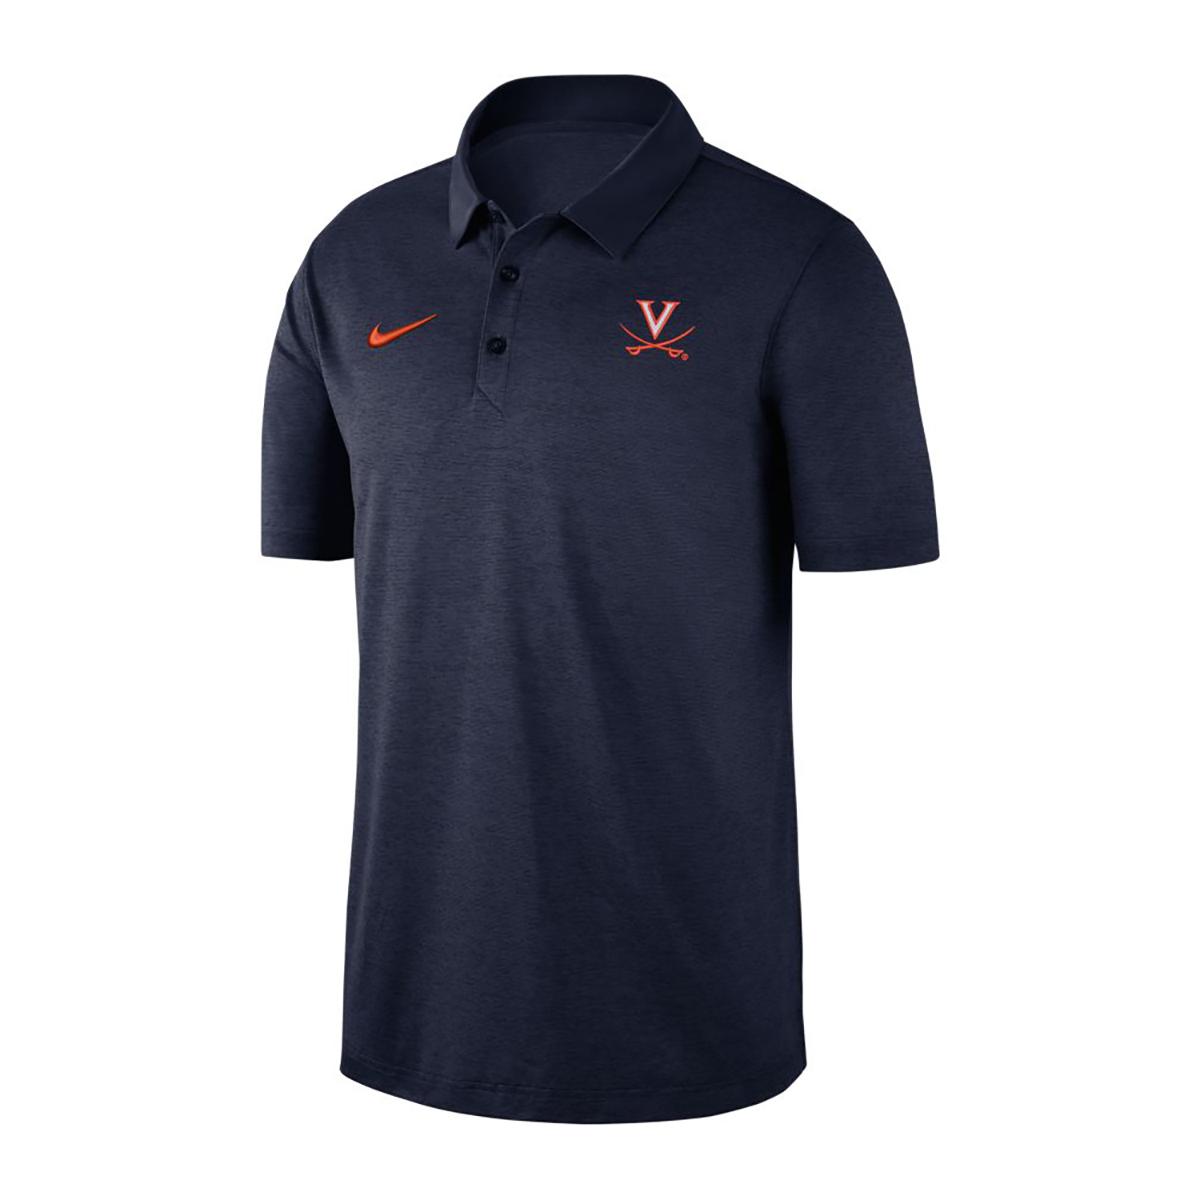 University of Virginia Nike Navy V-Sabre Polo